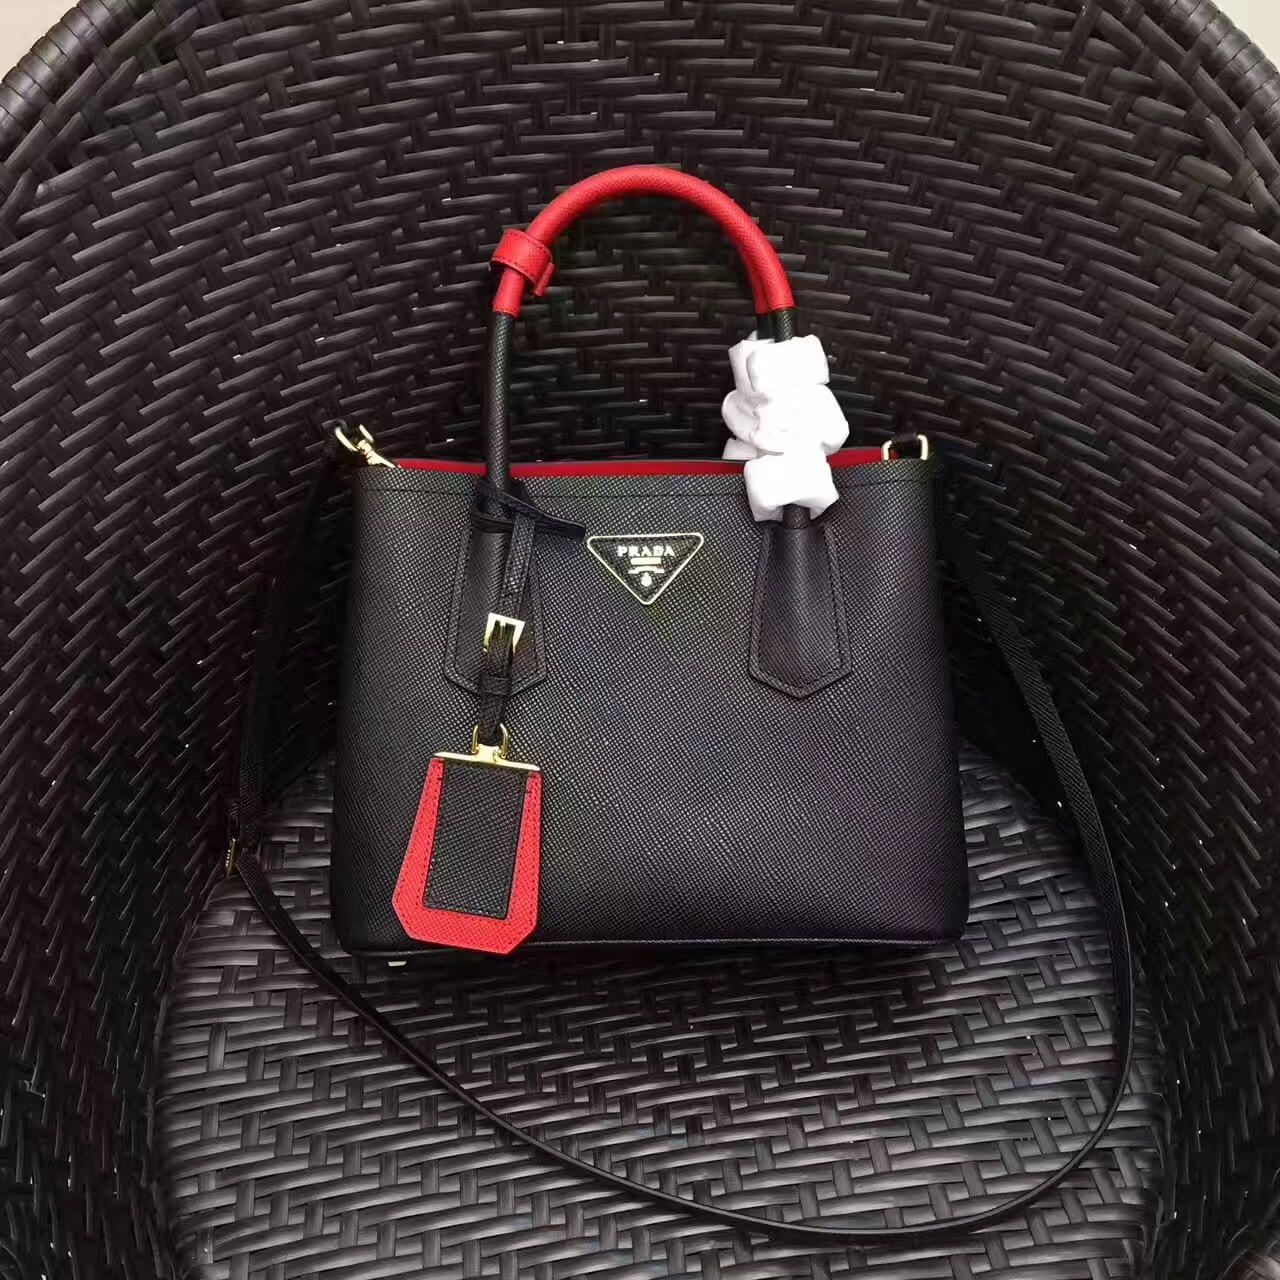 20808dcbec Prada 1BG886 Mini Two-Tone Saffiano Leather Double Bag Black Red 2017